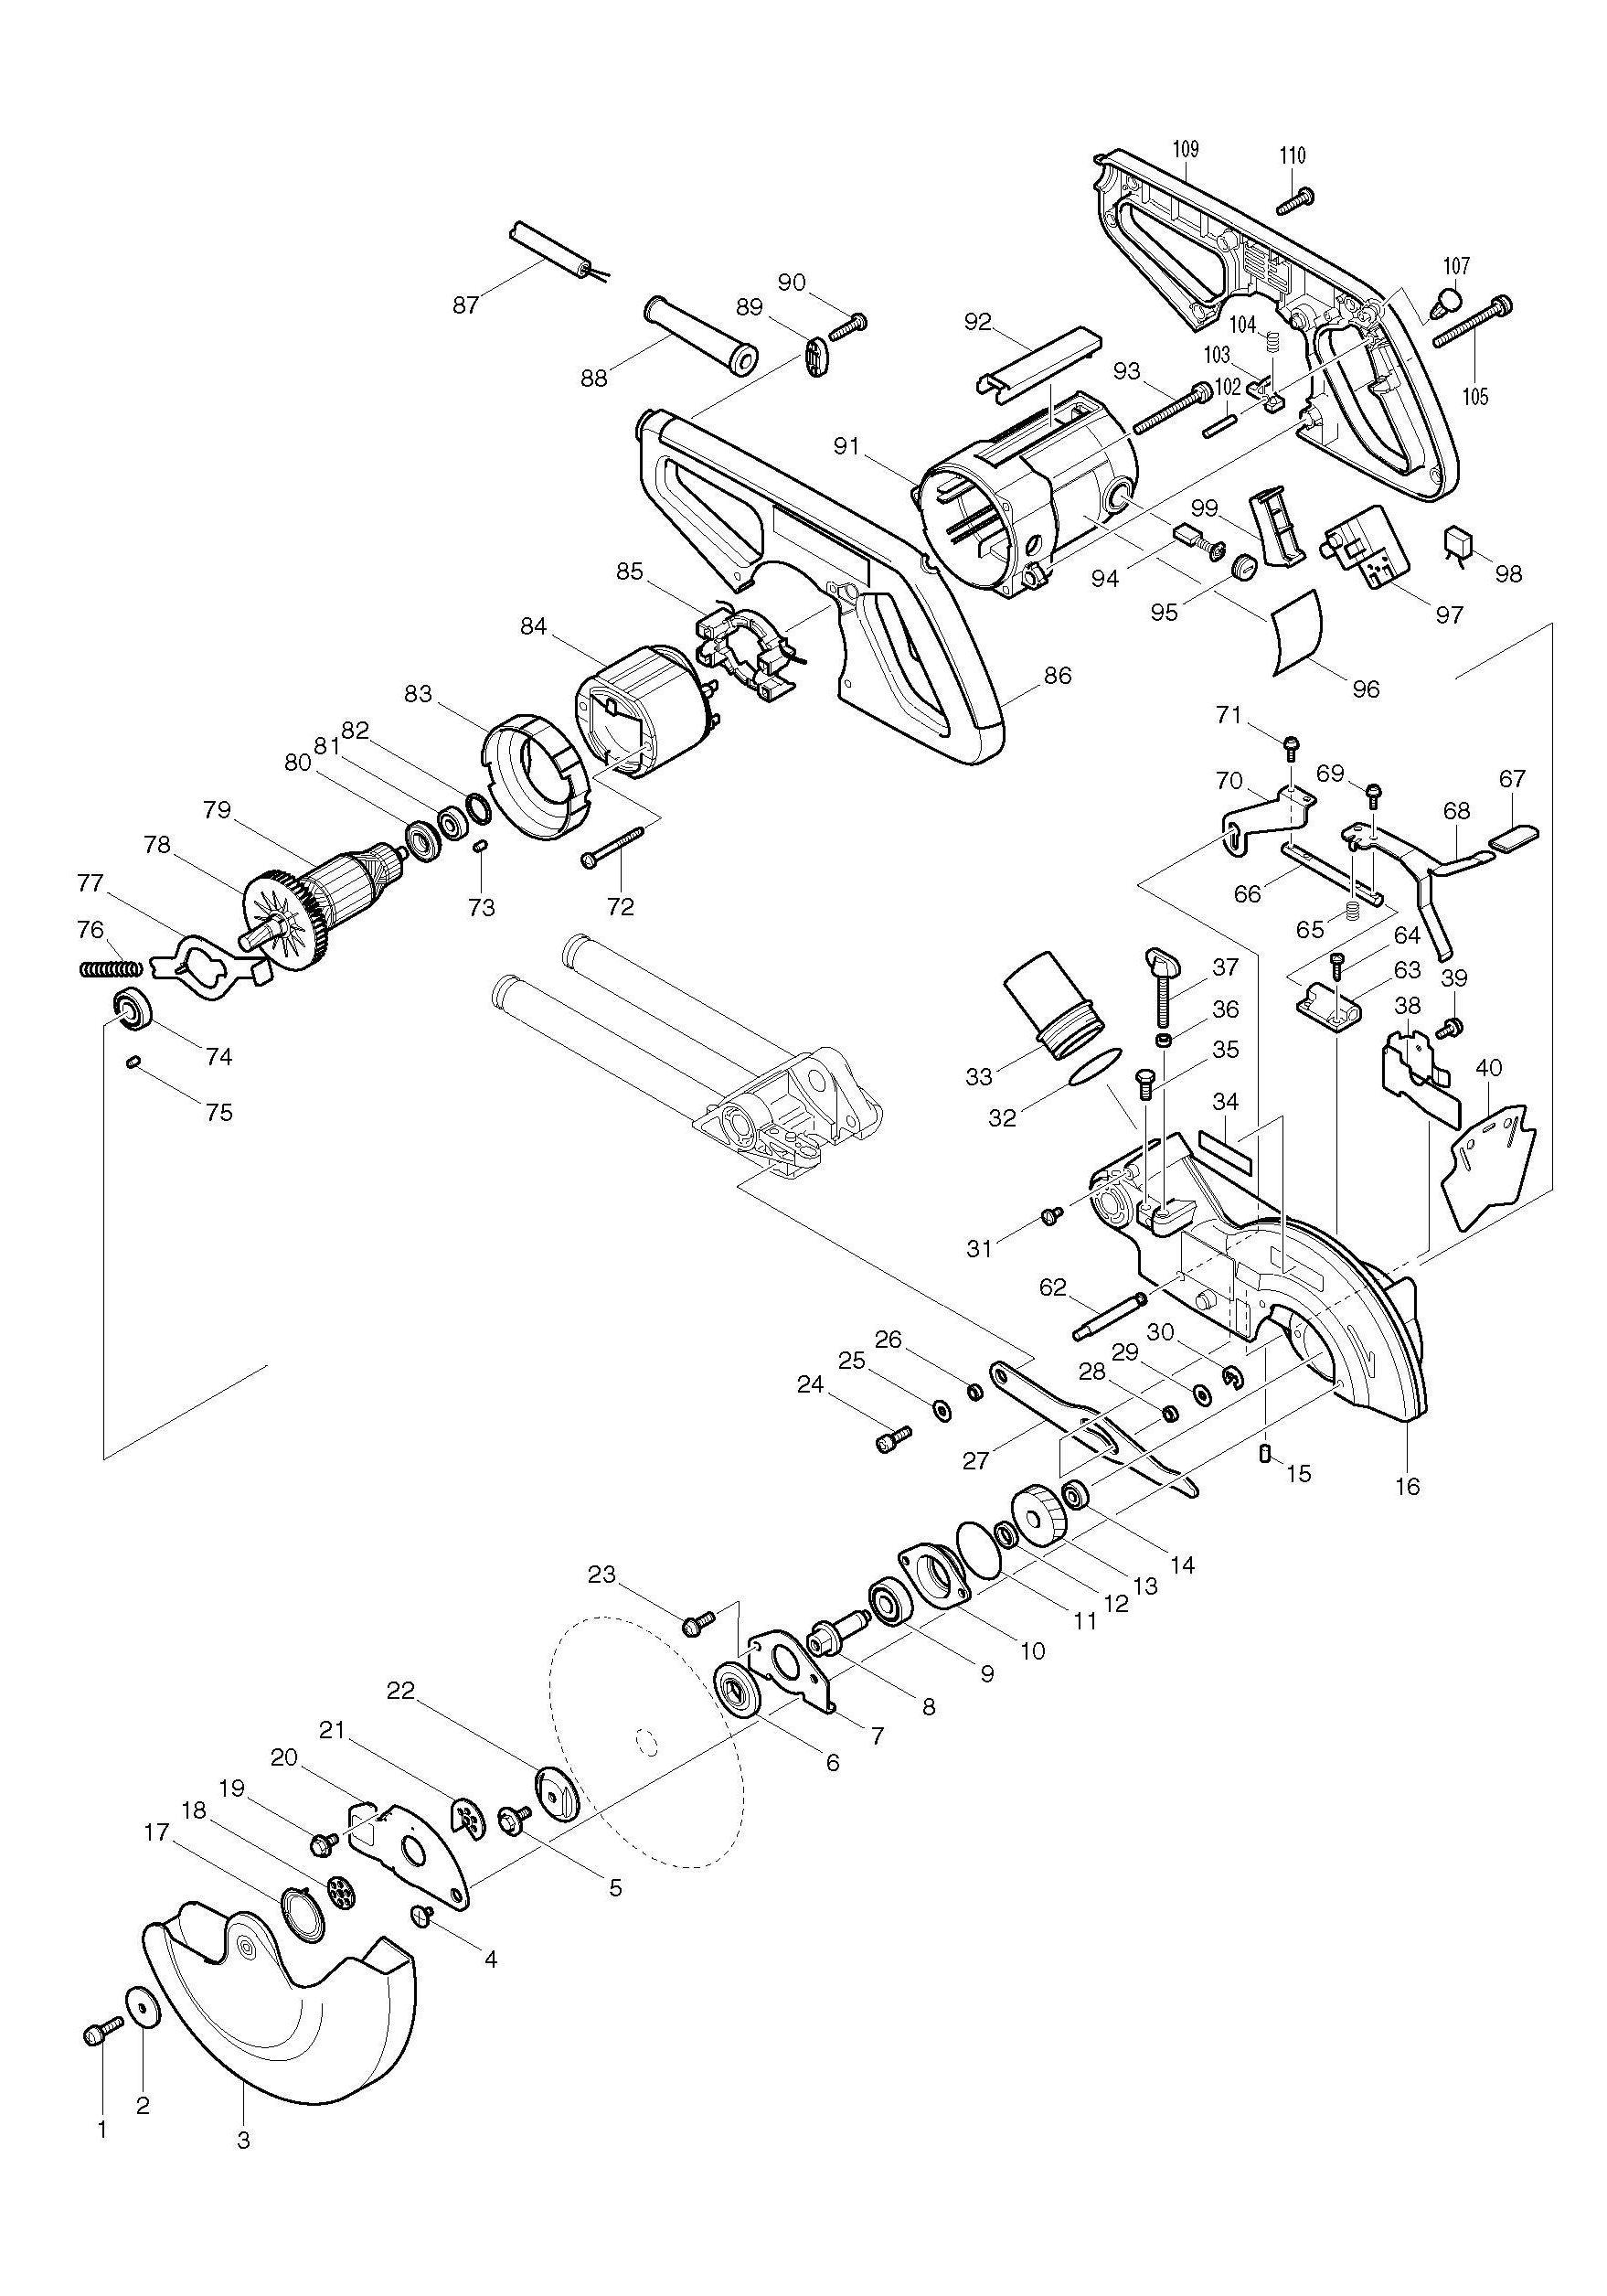 Spares For Makita Ls Slide Compound Mitre Saw 190mm